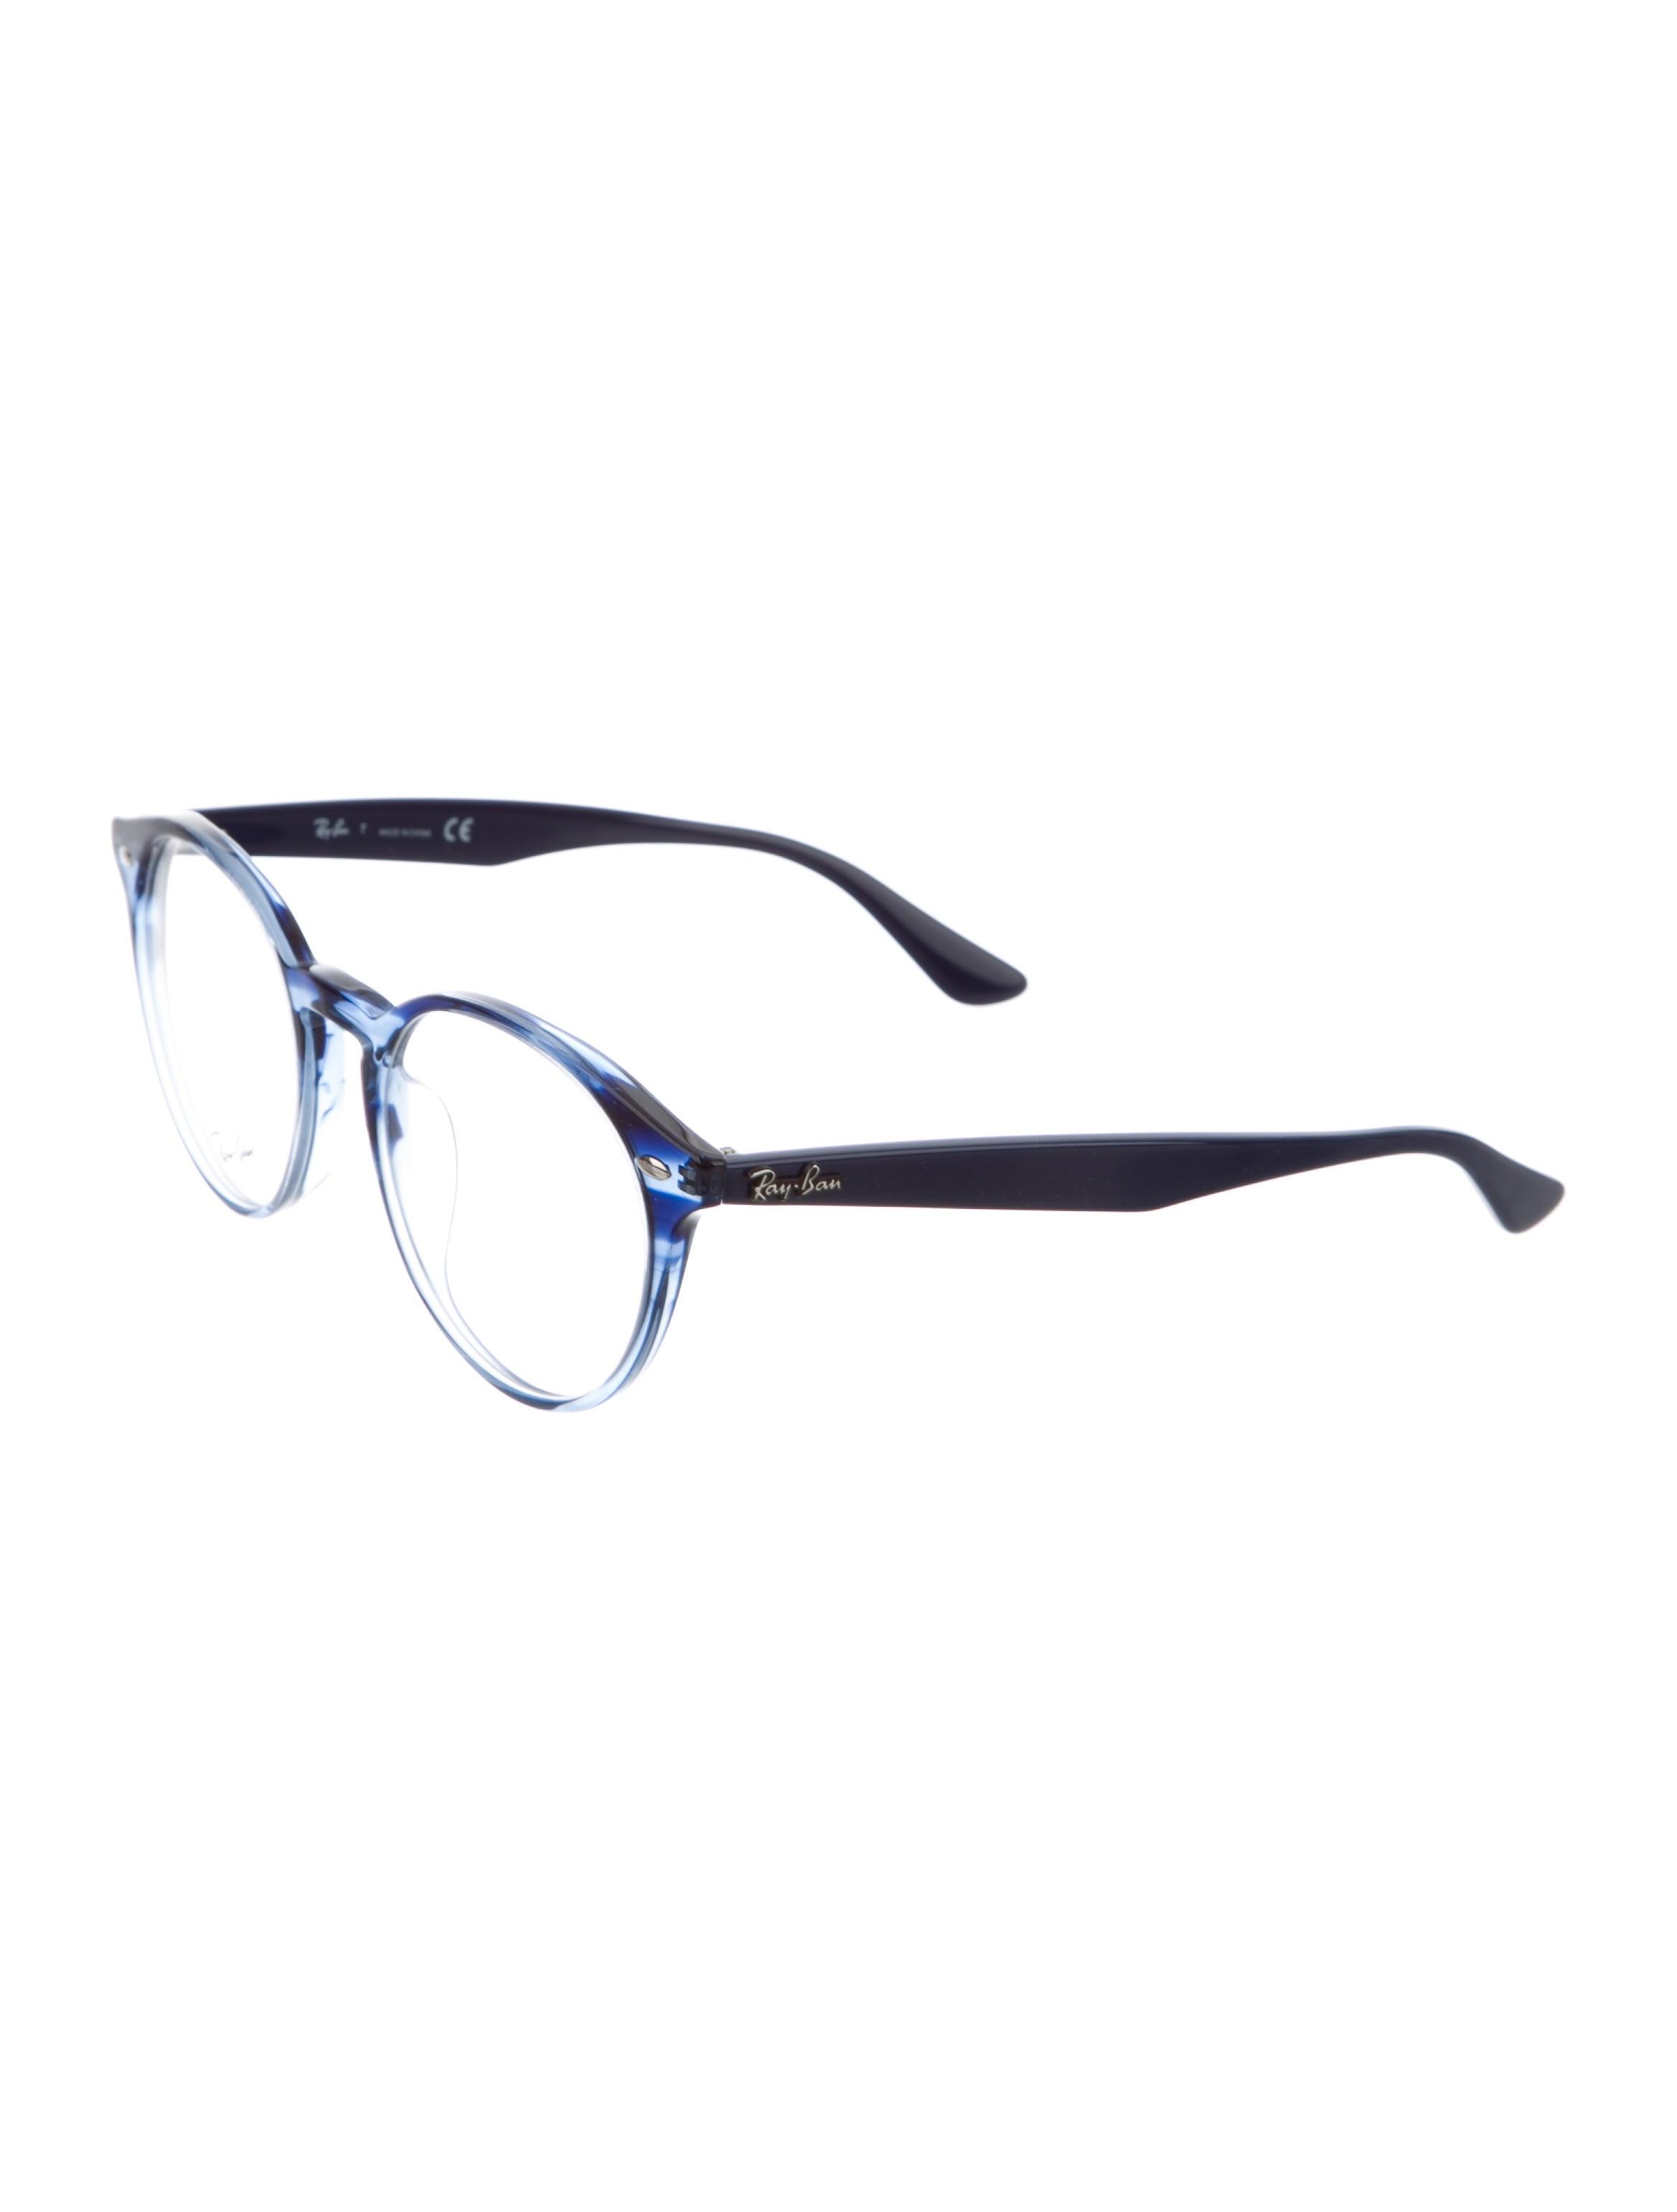 c2b95adfbaa40 Round Ray Ban Women Eyeglasses « Heritage Malta